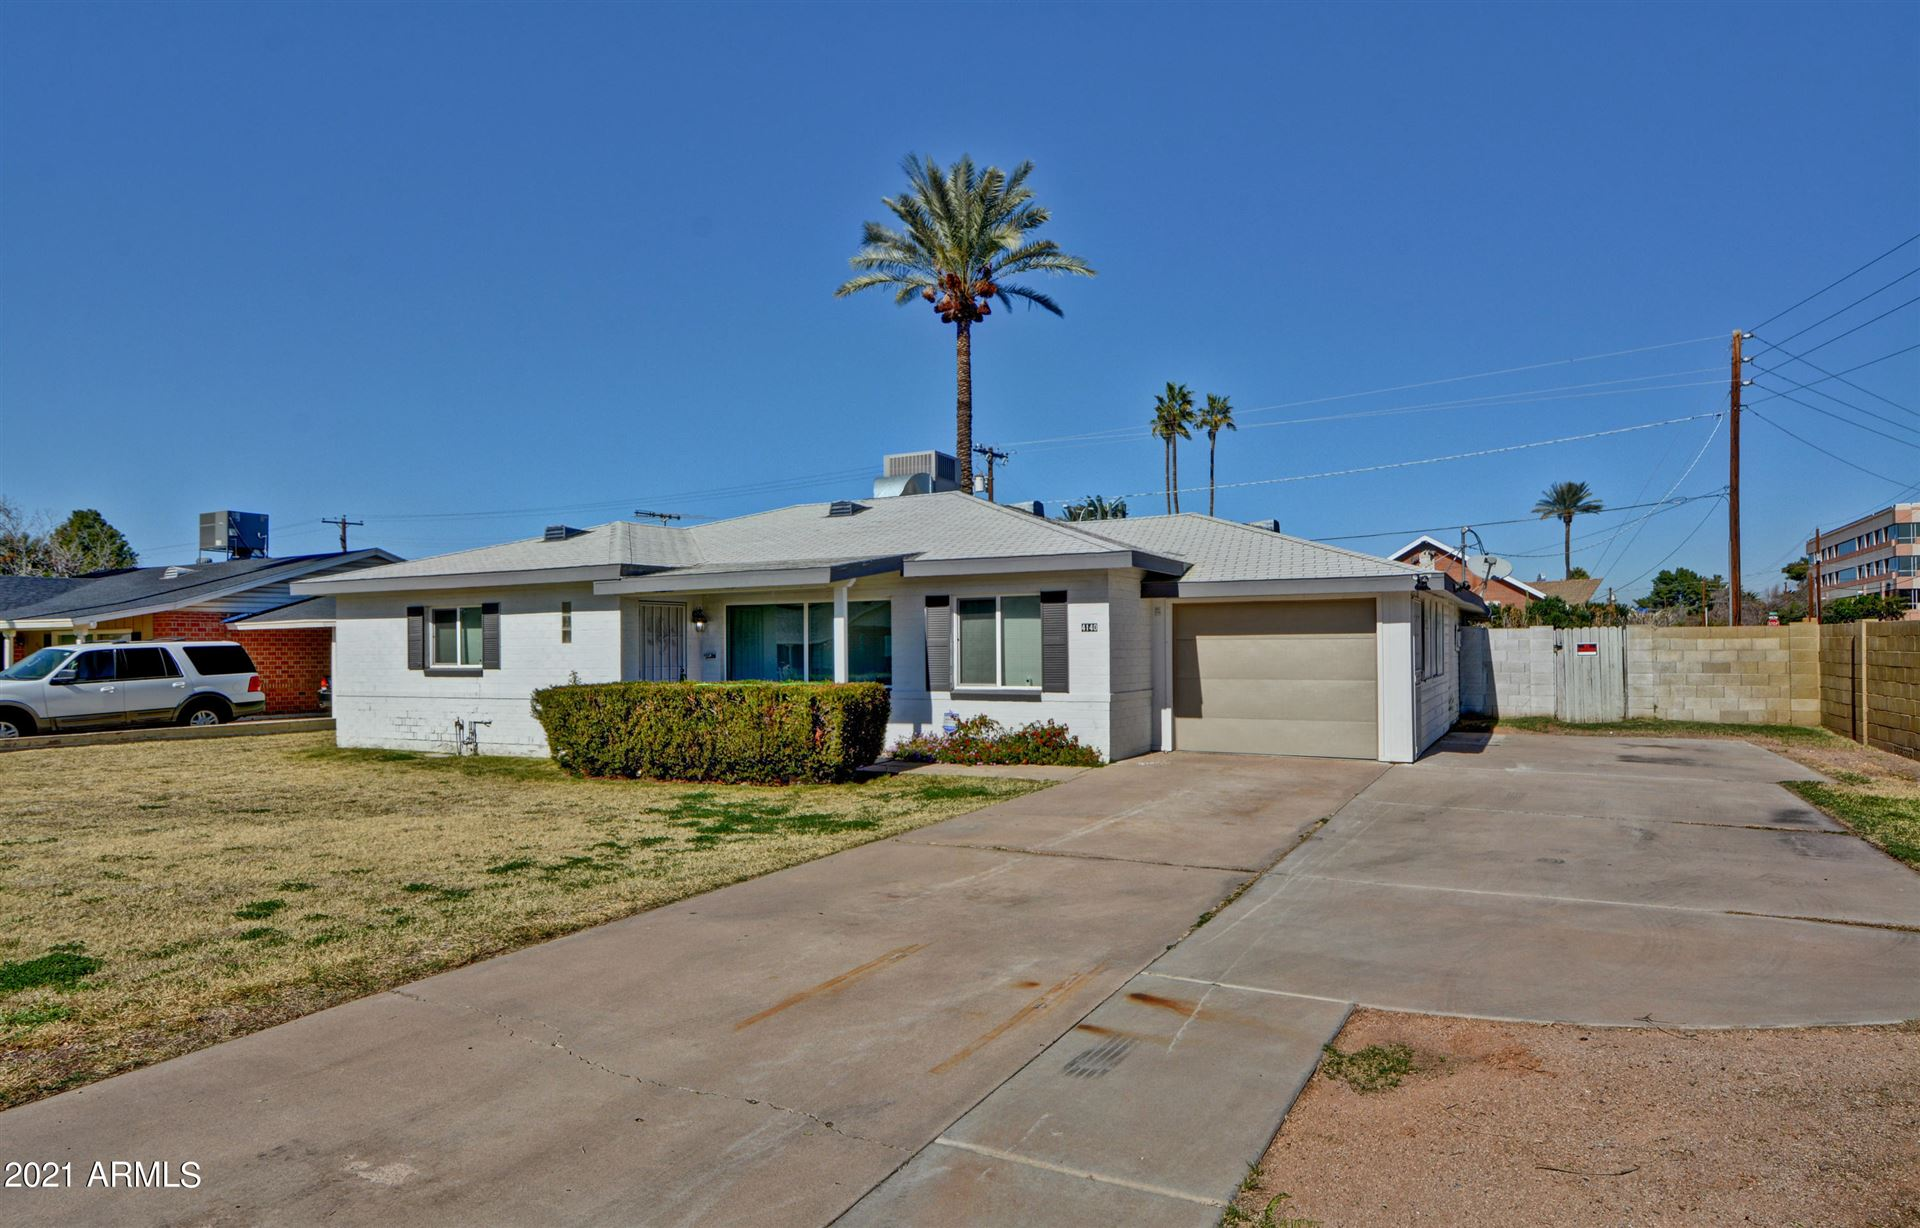 4140 E EDGEMONT Avenue, Phoenix, AZ 85008 - MLS#: 6195778